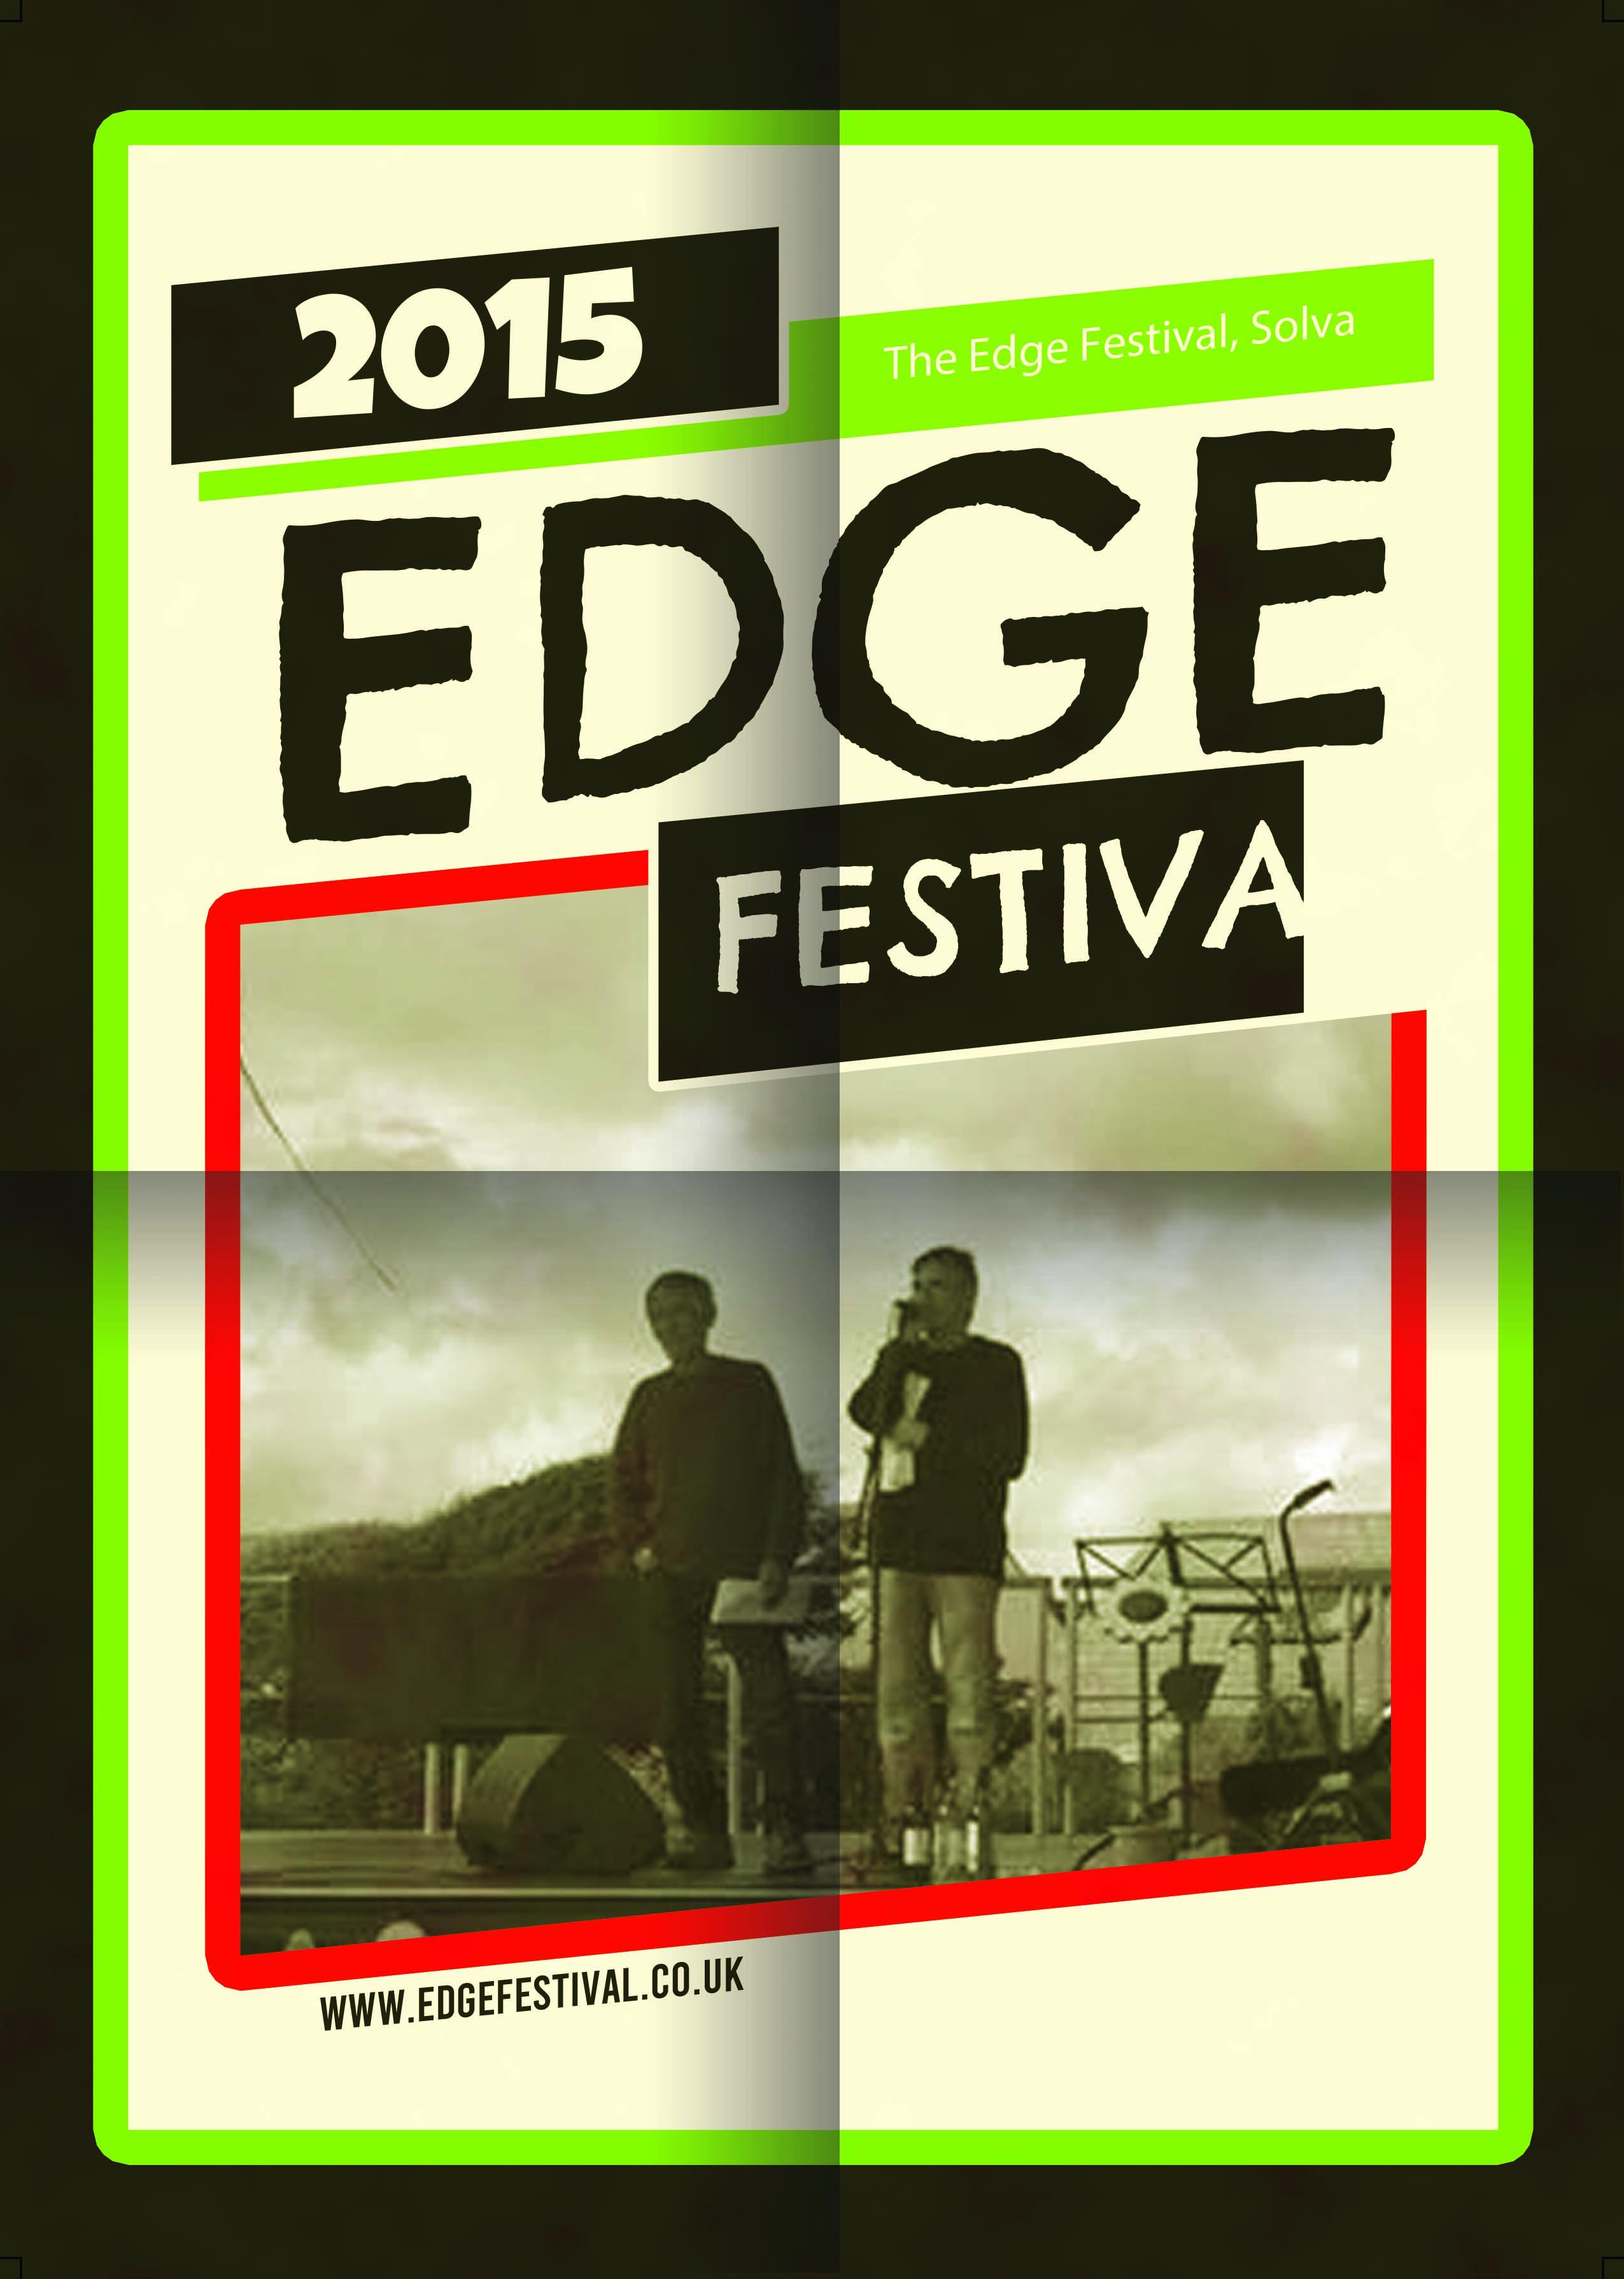 Edge Festival 2015